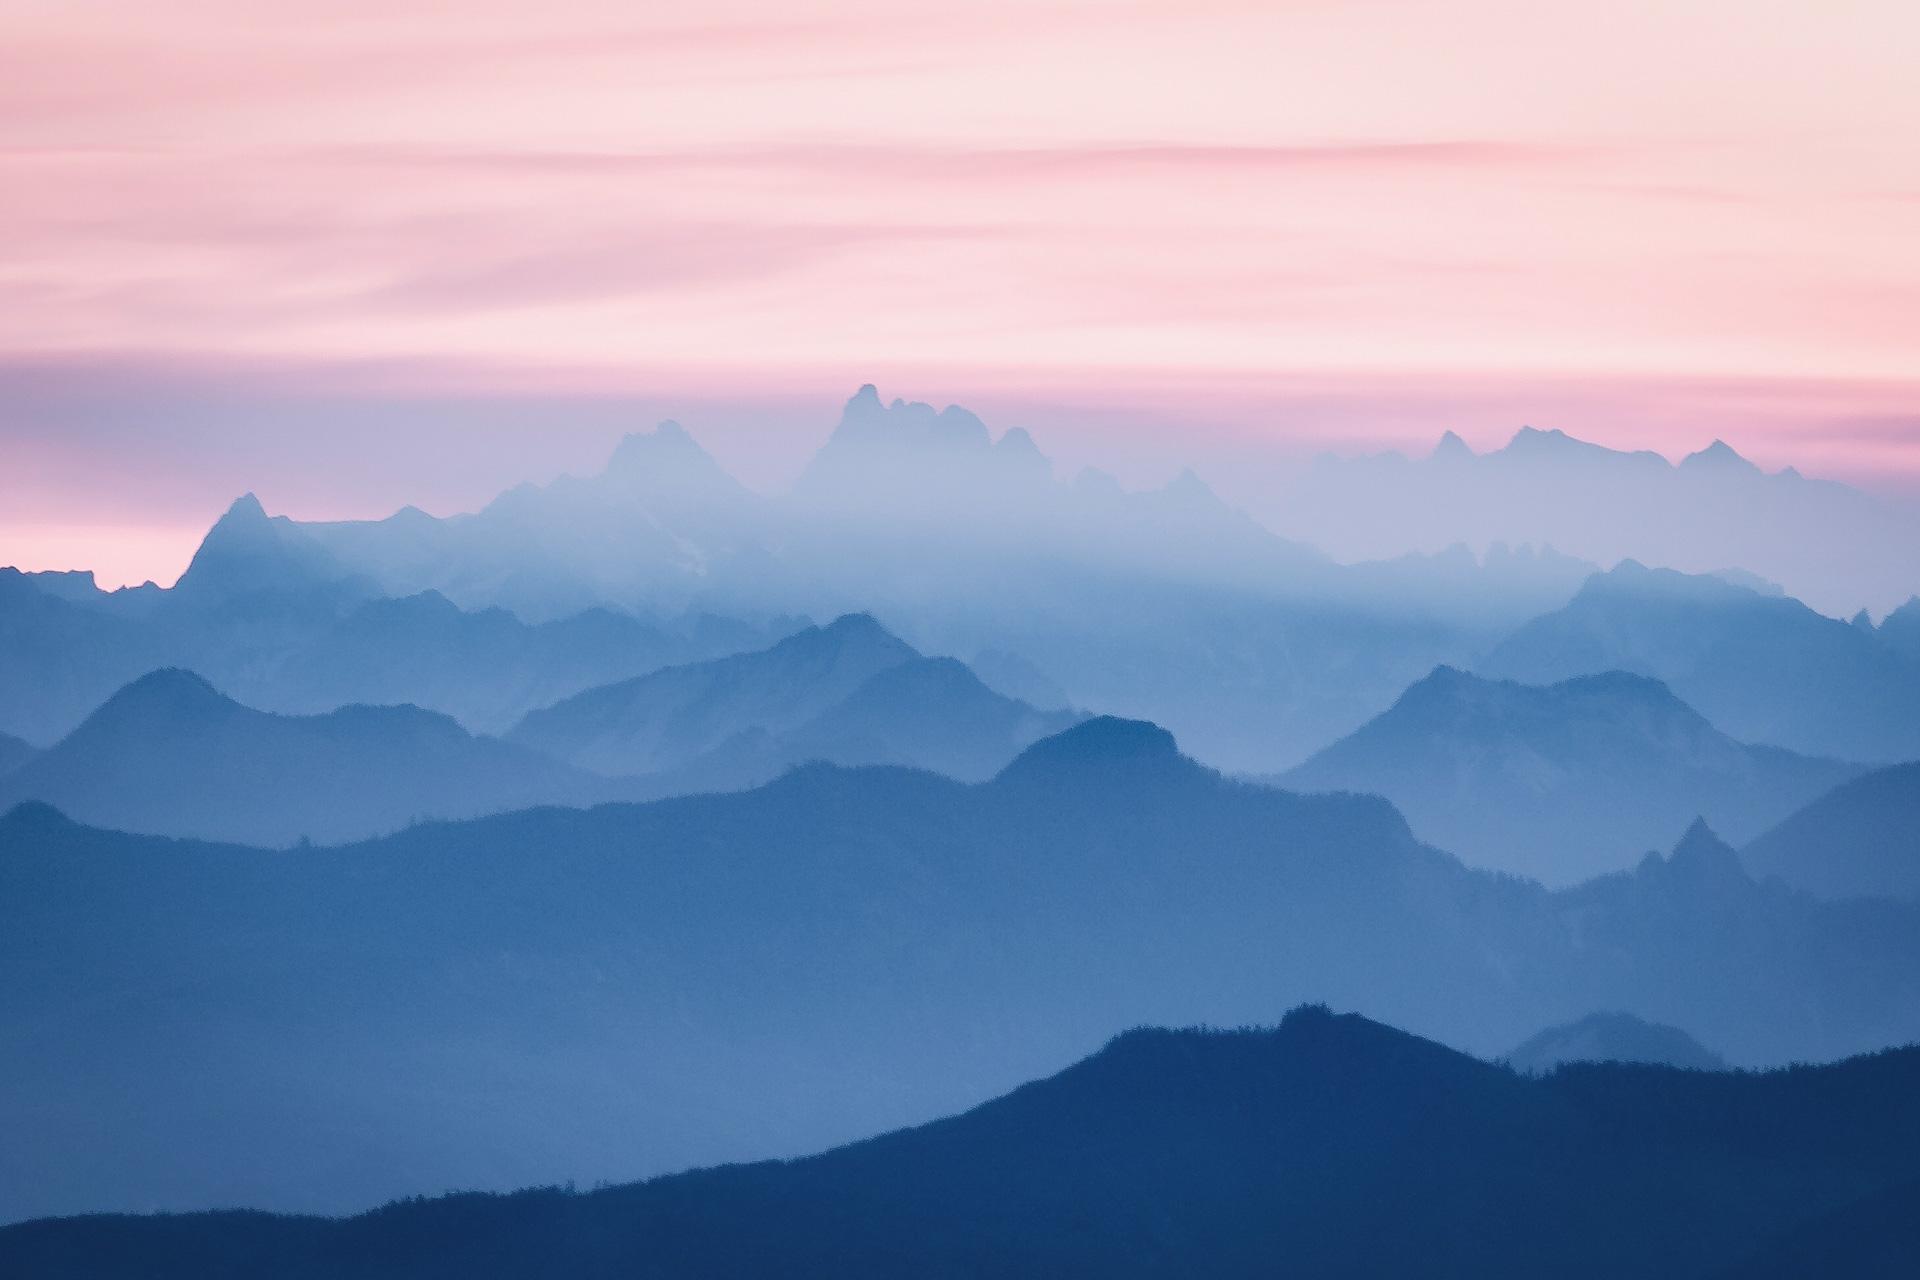 Christian-Schaffer-Mount-Rainier-Washington-022.jpg